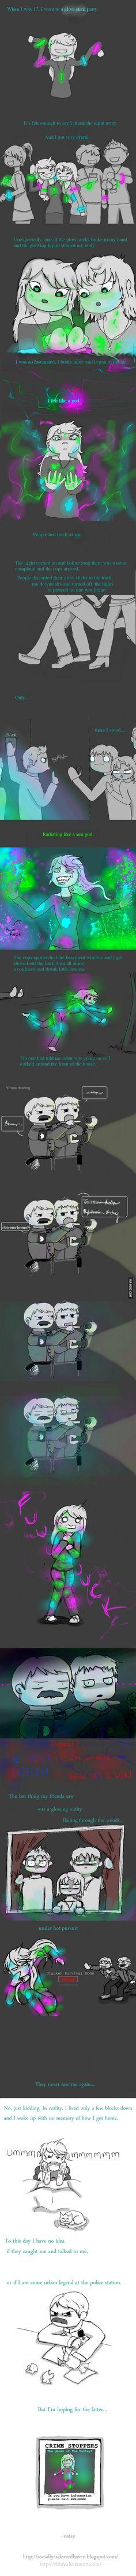 This is so amazing omg (i break glow sticks on purpose cuz i like to put glow on everything lol)